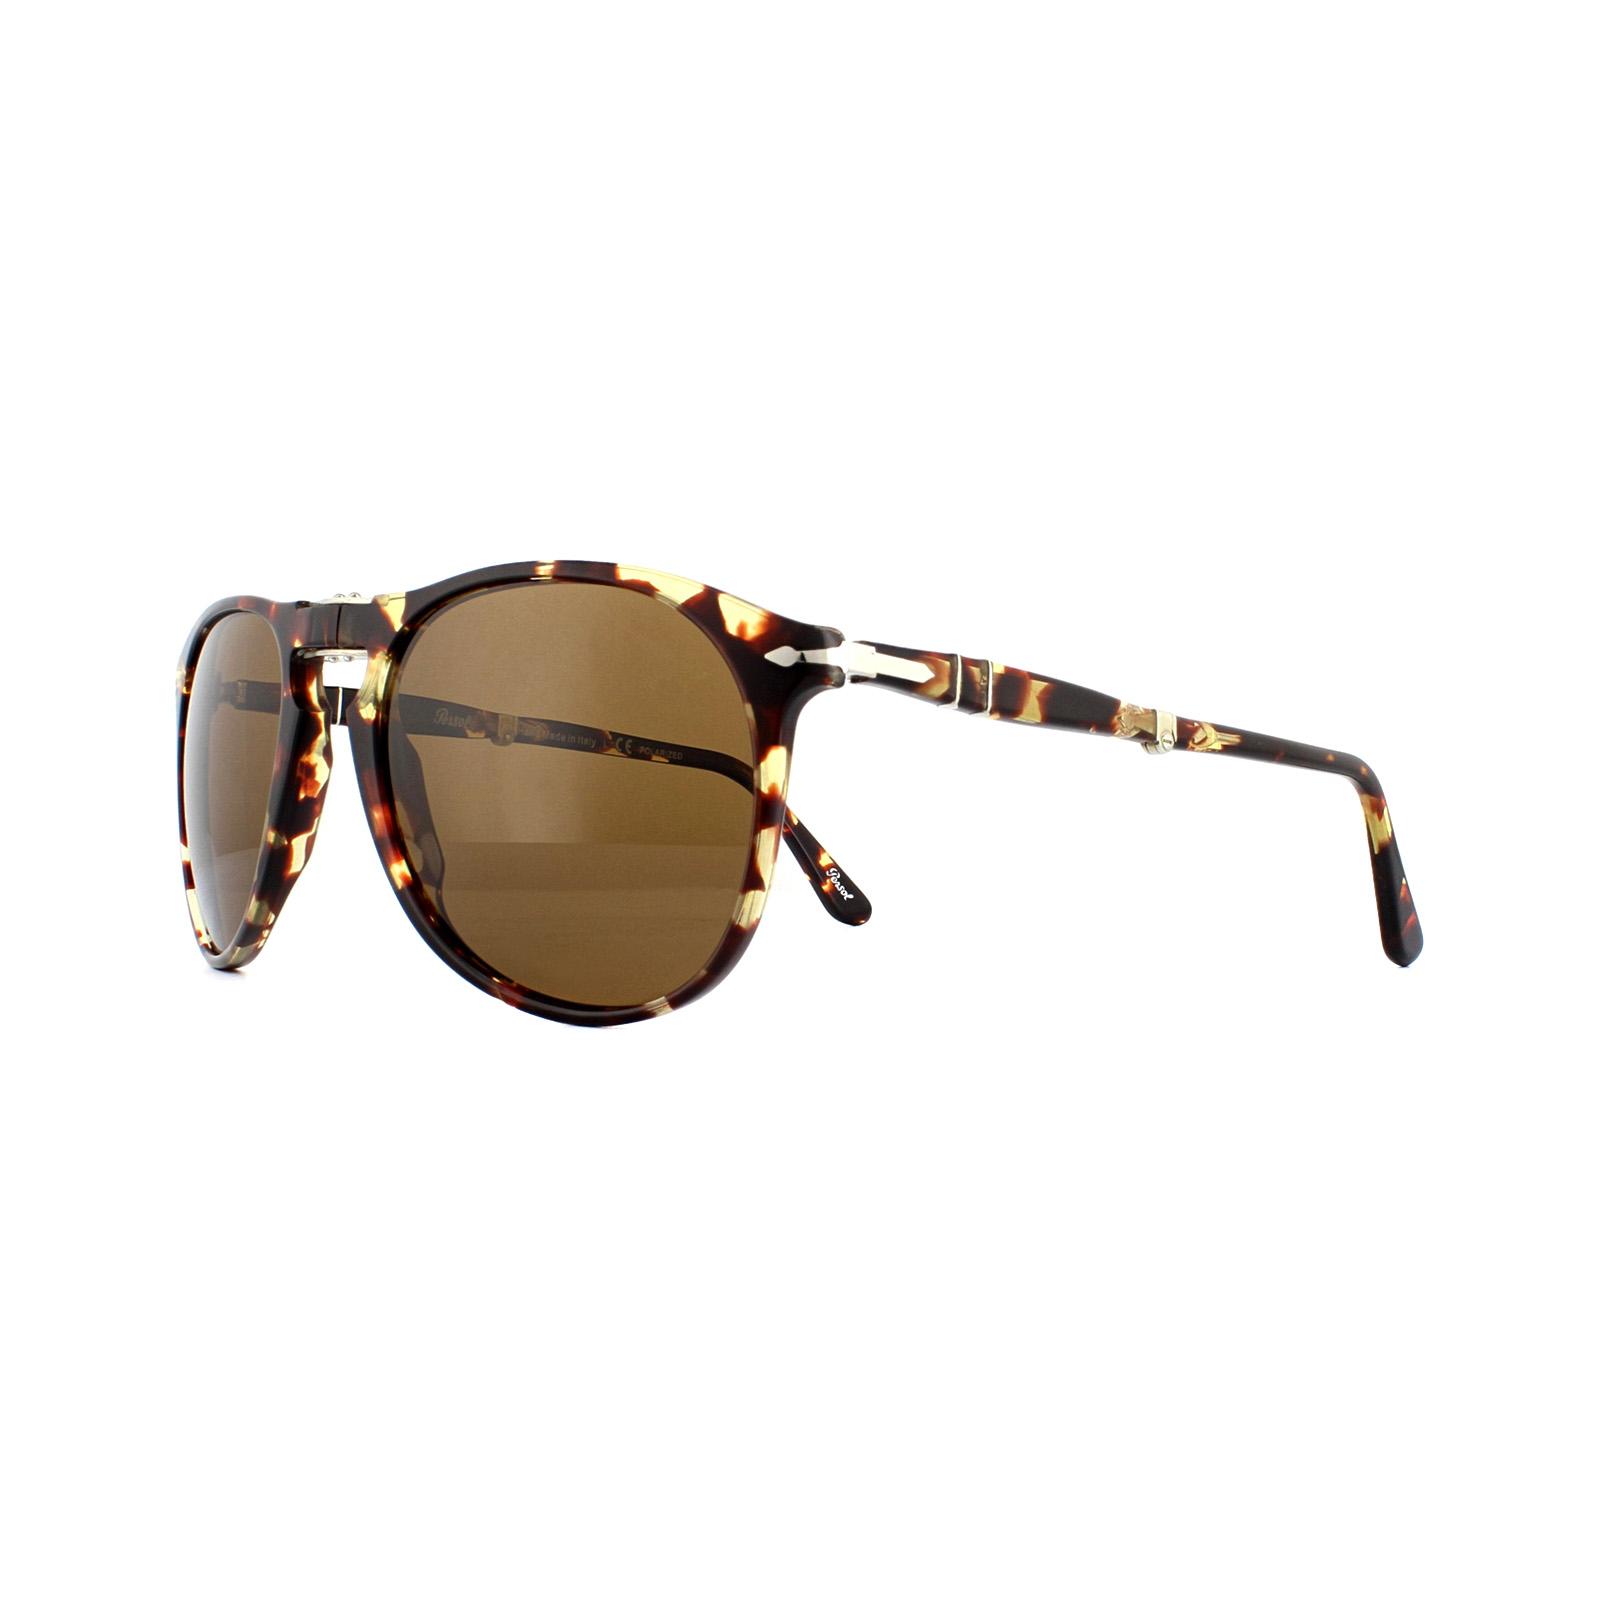 ac0d4499d Persol Sunglasses 9714S 985/57 Tabacco Virginia Tortoise Brown ...